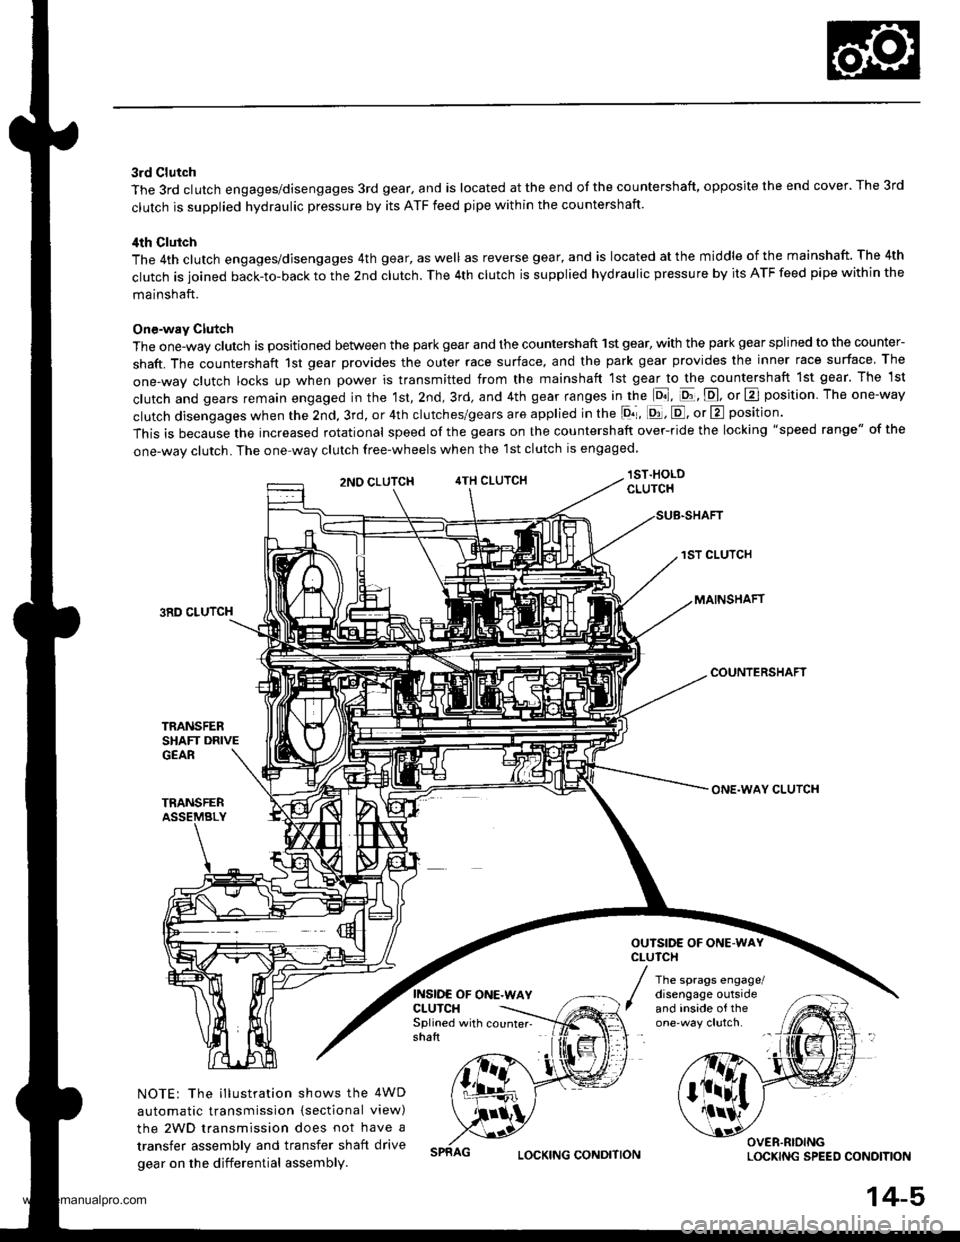 Honda Cr V 1998 Rd1 Rd3 1g Workshop Manual Crv Clutch Diagram